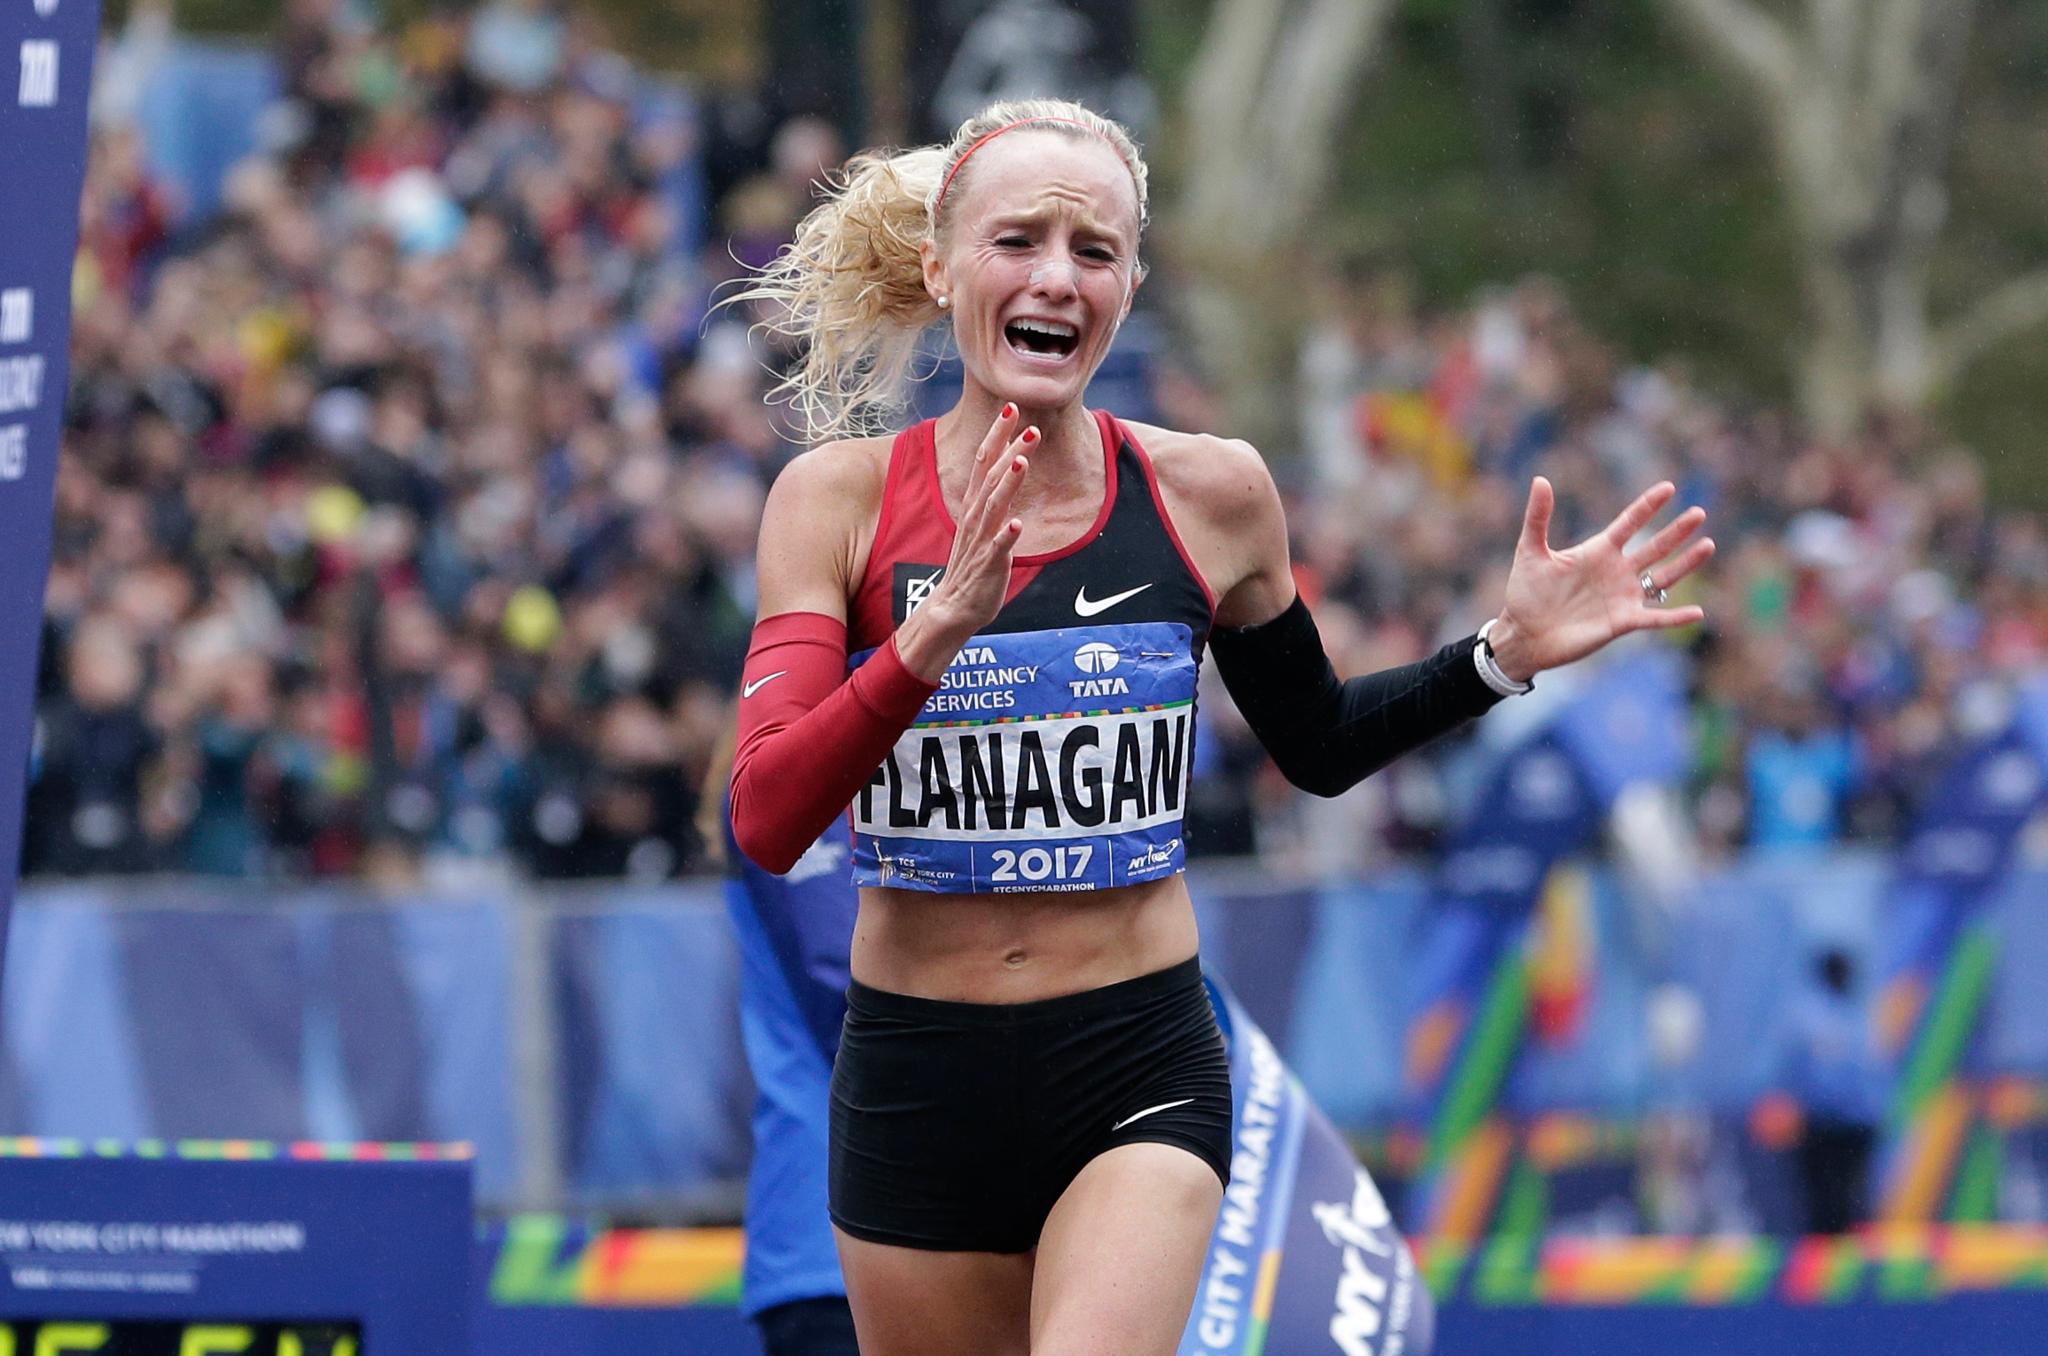 Female runner expressing emotion as she crosses finish line (© AP Images)